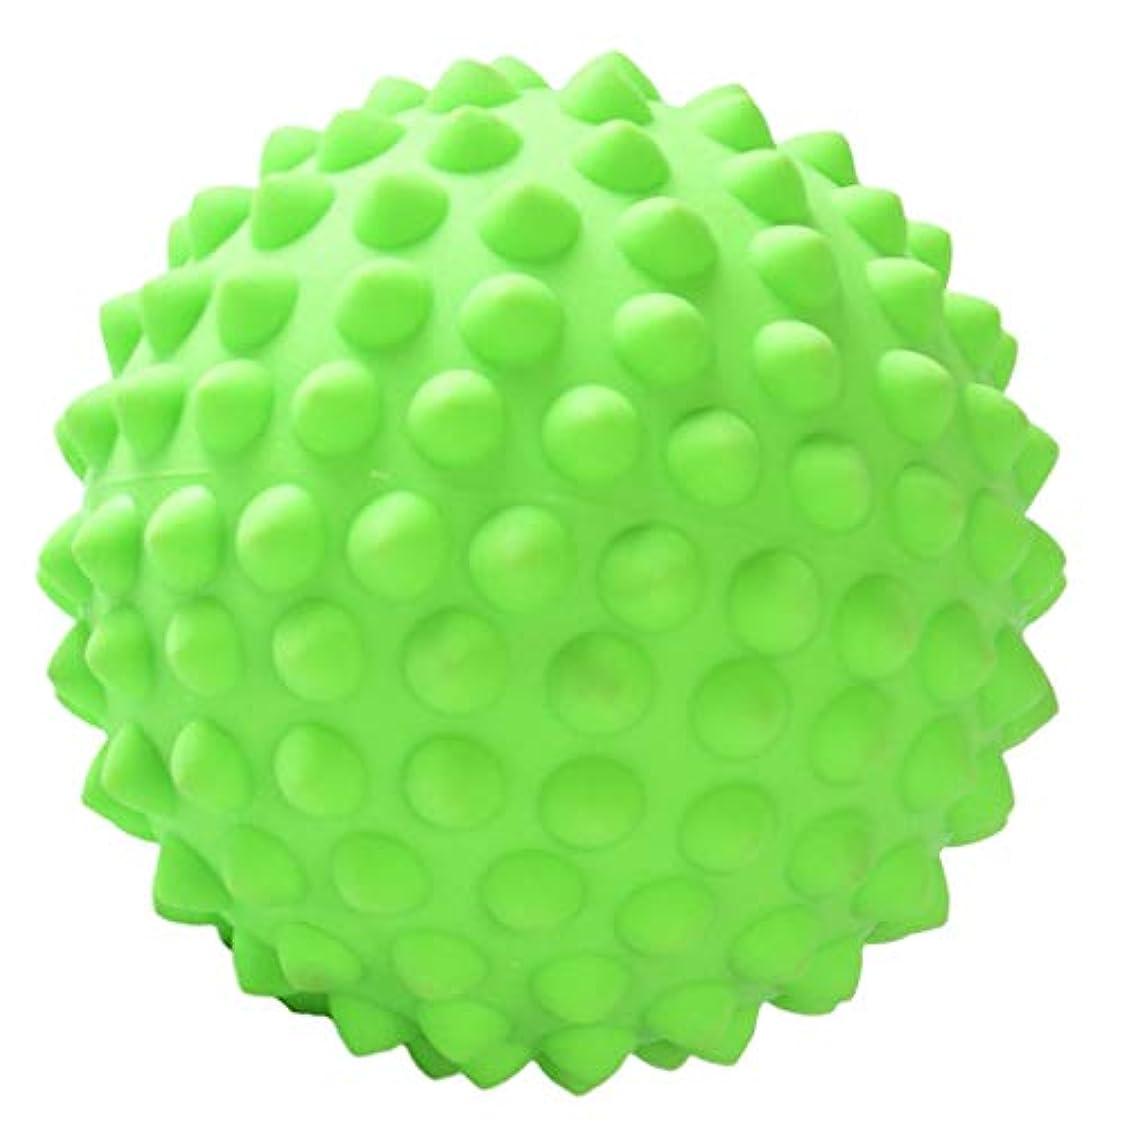 chiwanji ハードスパイキーマッサージボールボディディープティッシュリラクゼーション足底筋膜炎の救済 - 緑, 説明のとおり